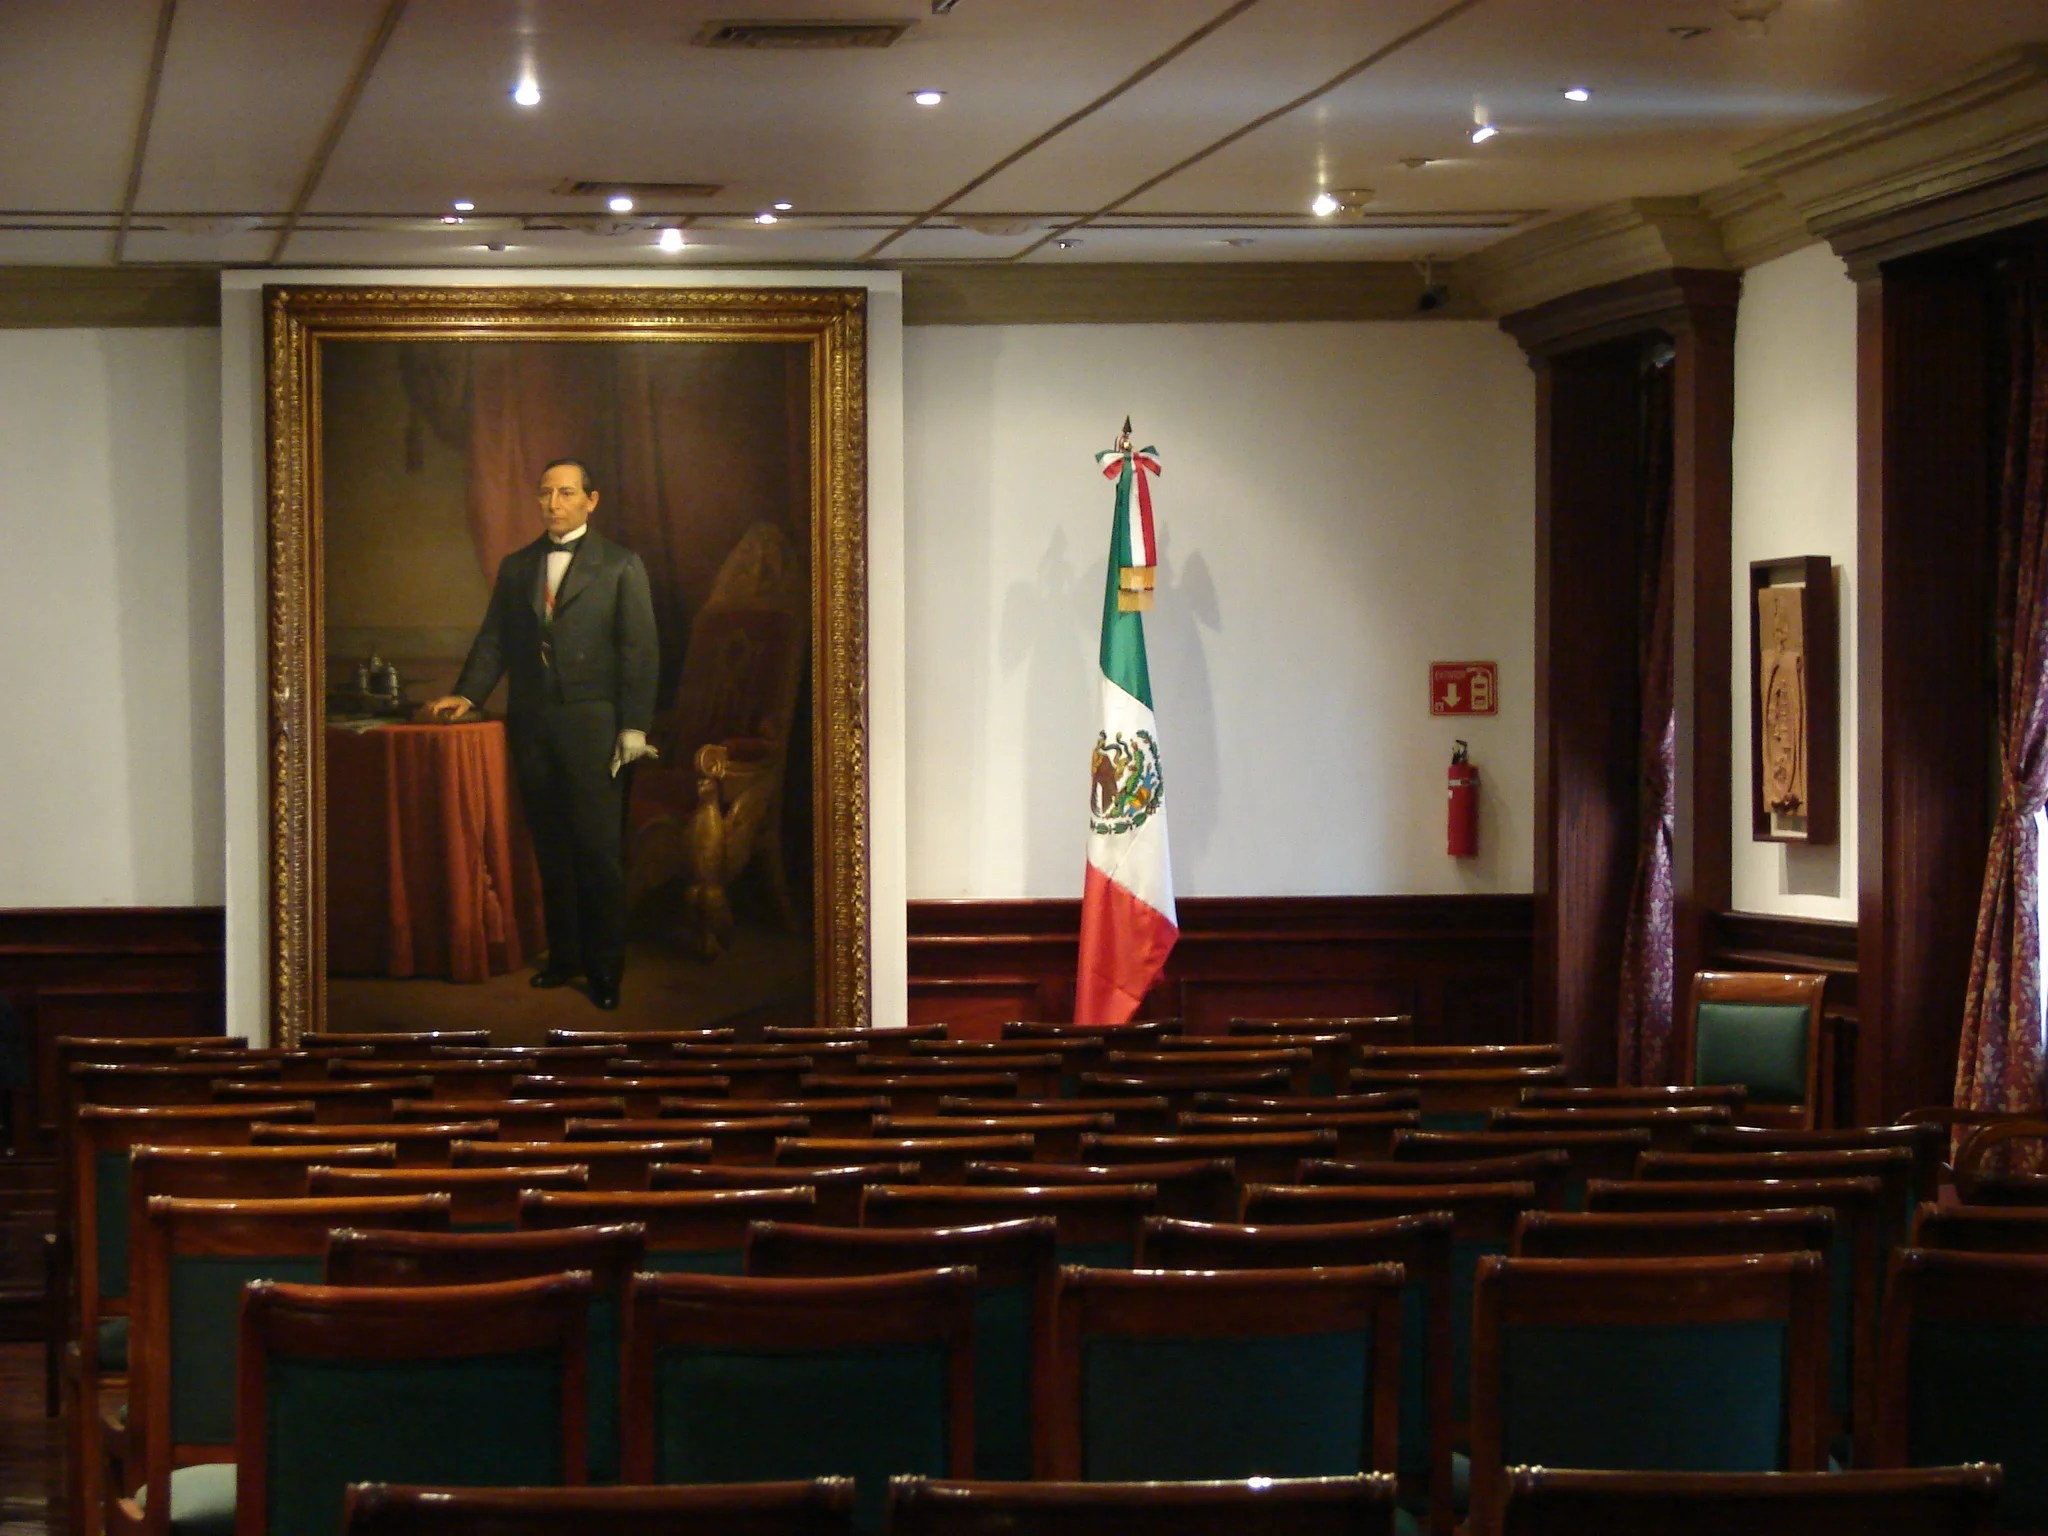 Fotos de Recinto de Homenaje a Benito Juarez  Imgenes